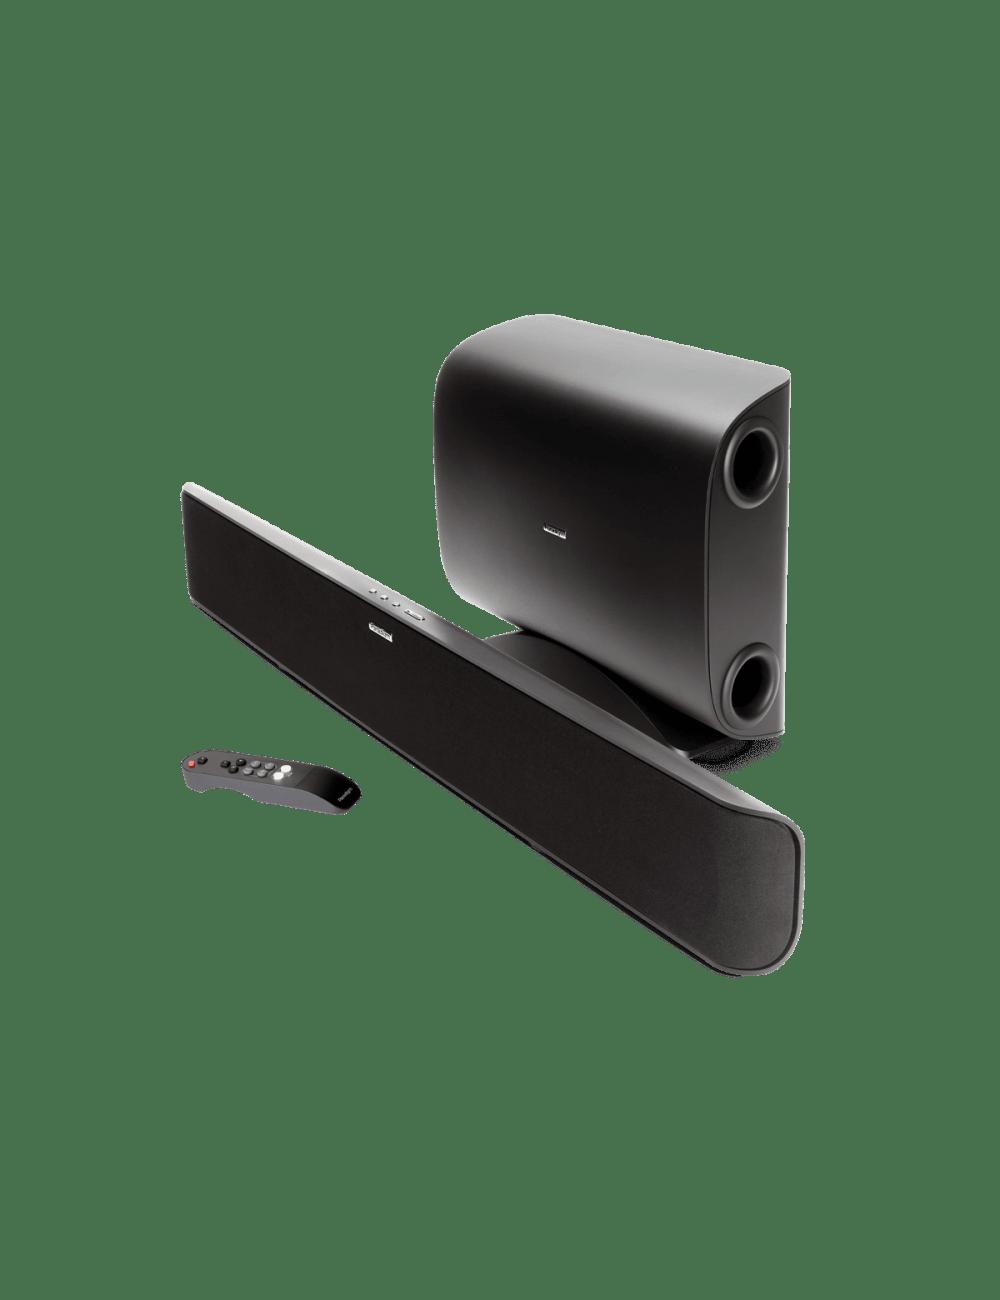 soundbar amplificata per home cinema, Bluetooth Music Streaming, Paradigm Soundtrack 2